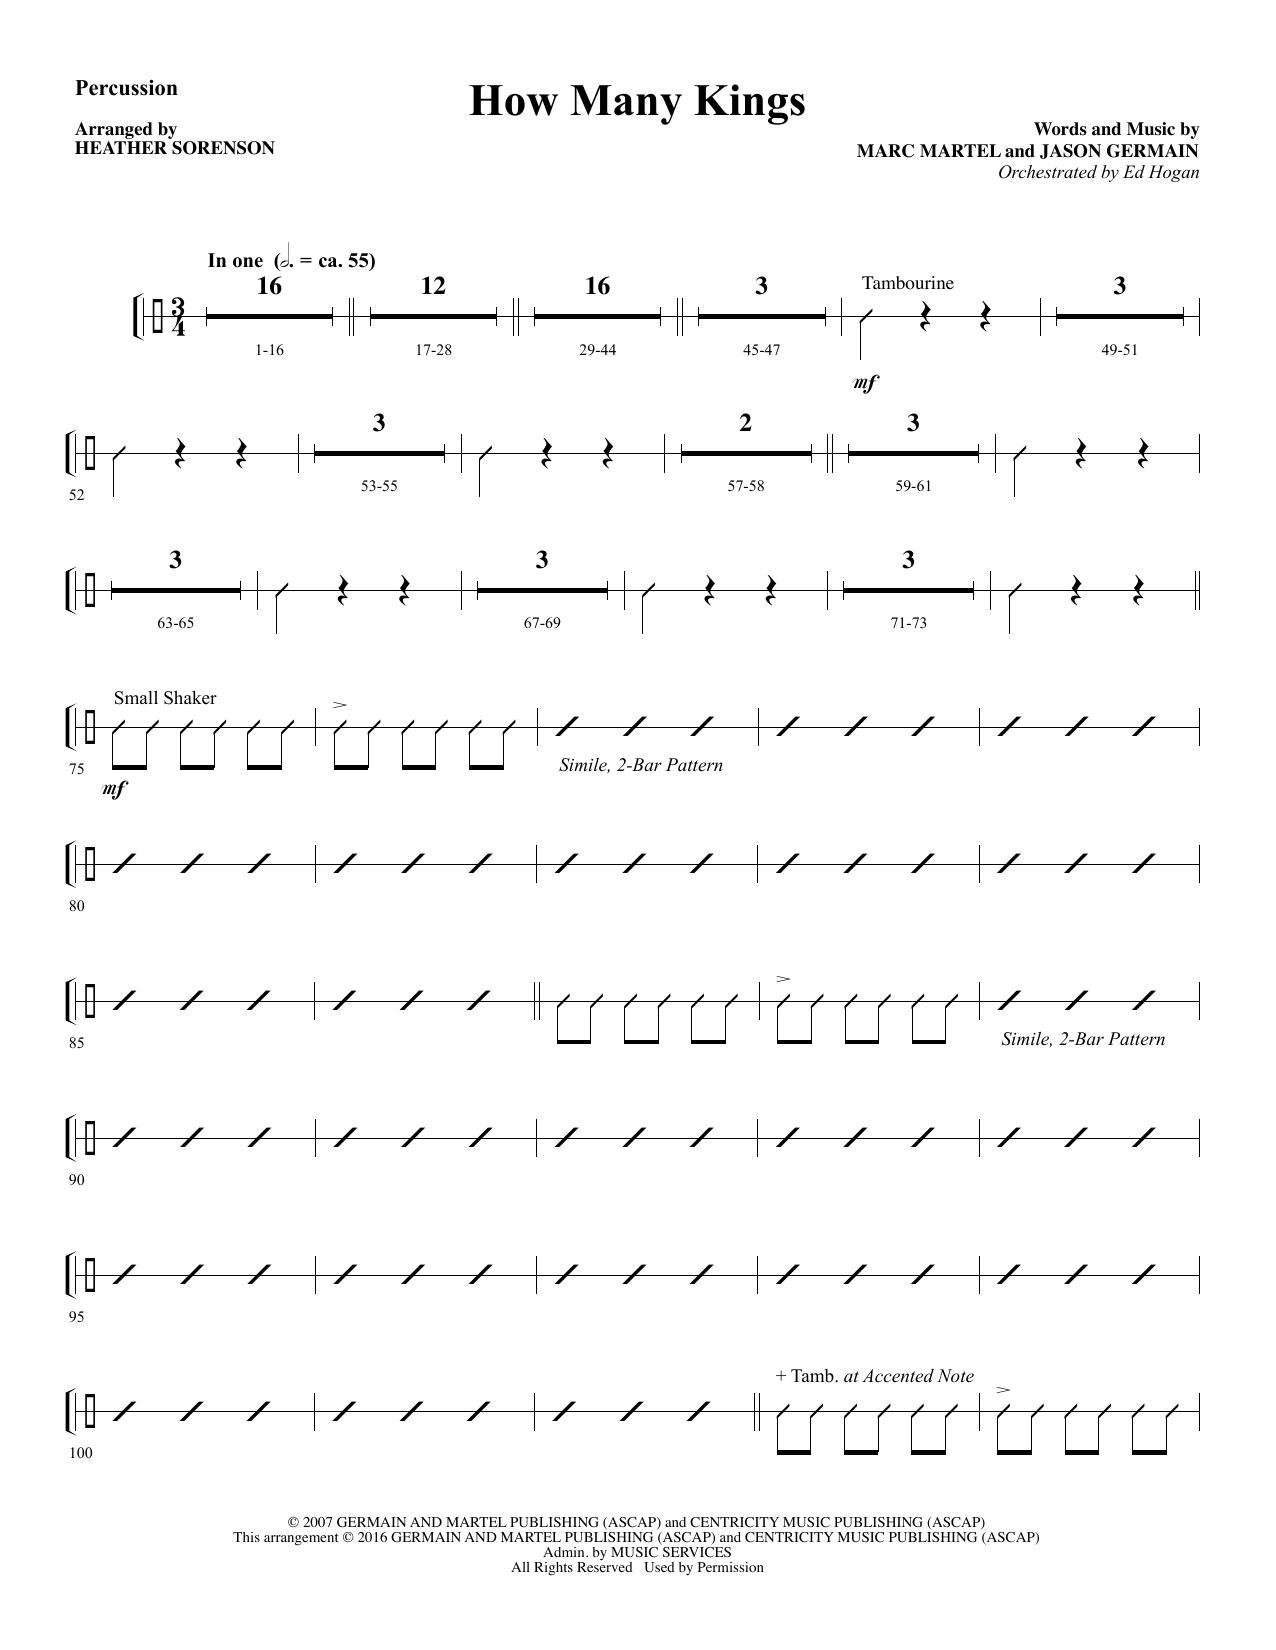 Jason Germain - How Many Kings - Percussion